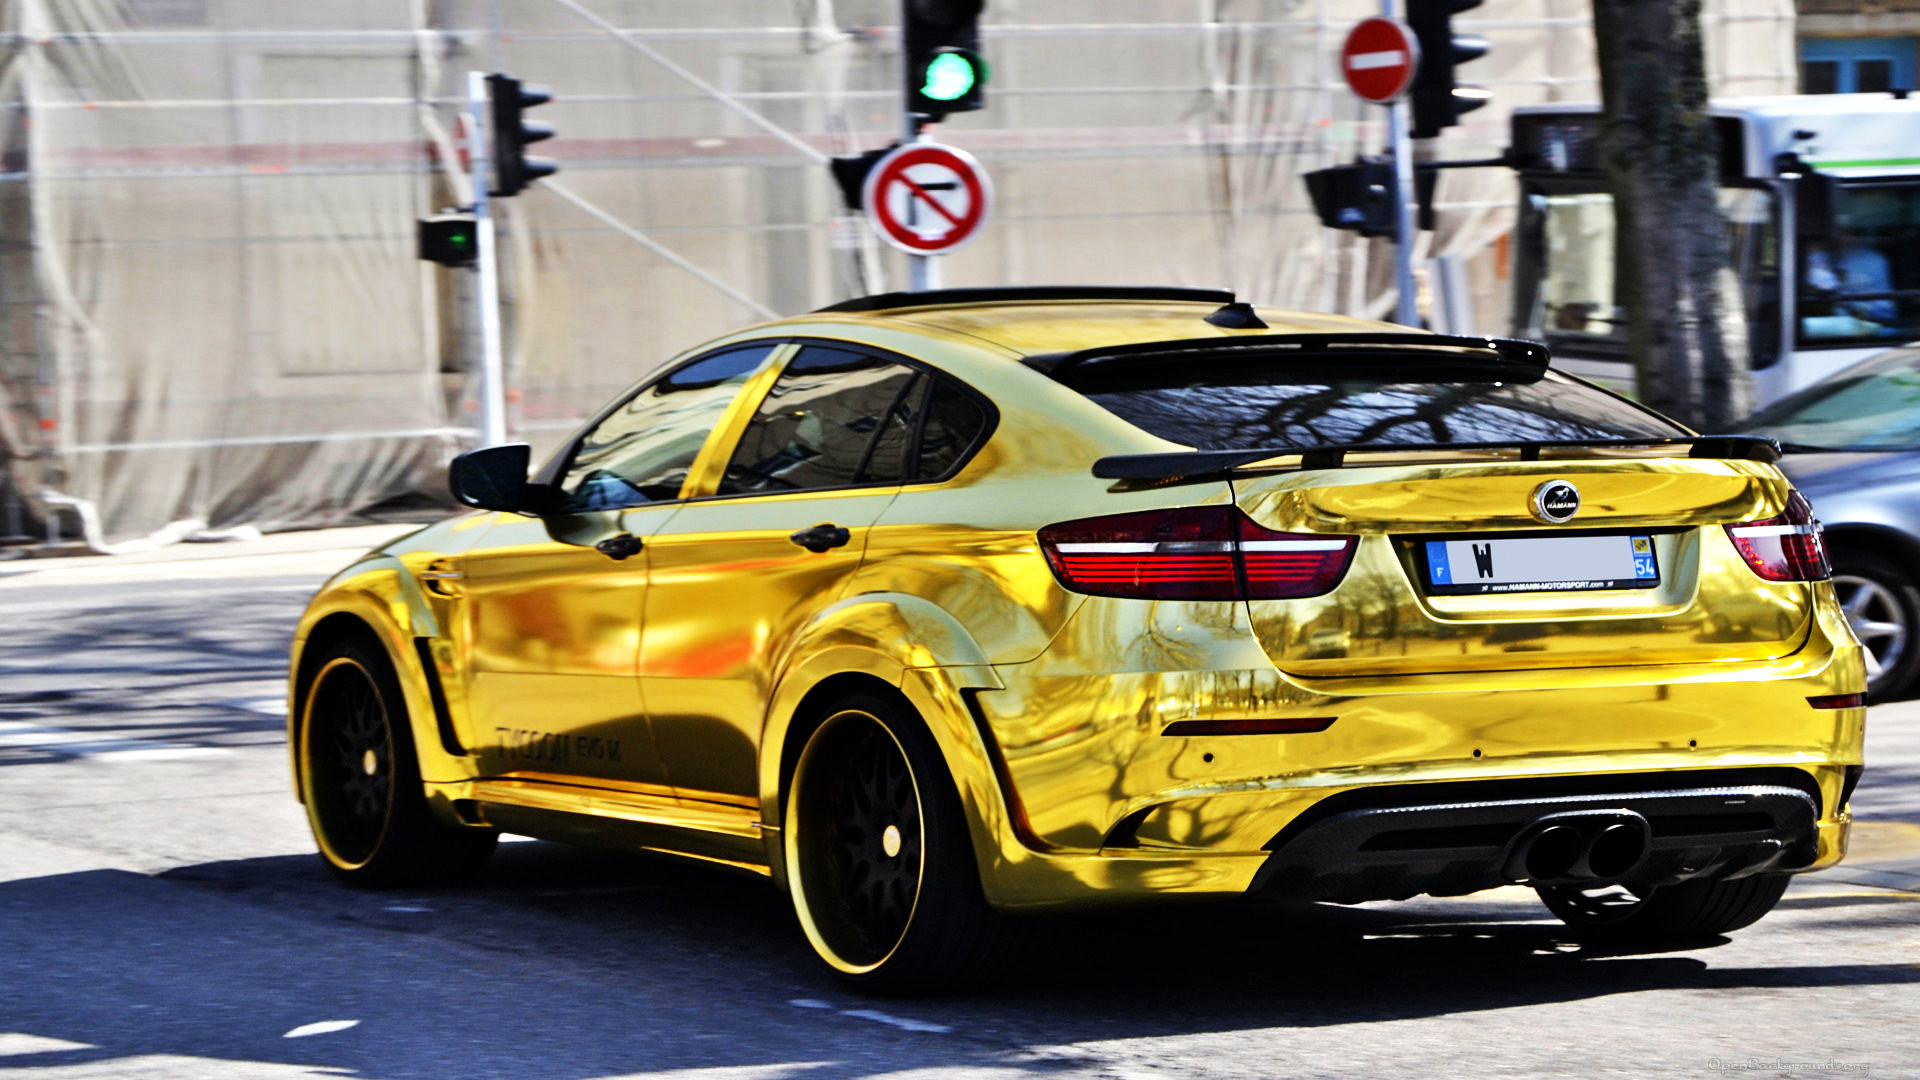 Gold BMW X6M Custom Hamann Supreme Edition #1